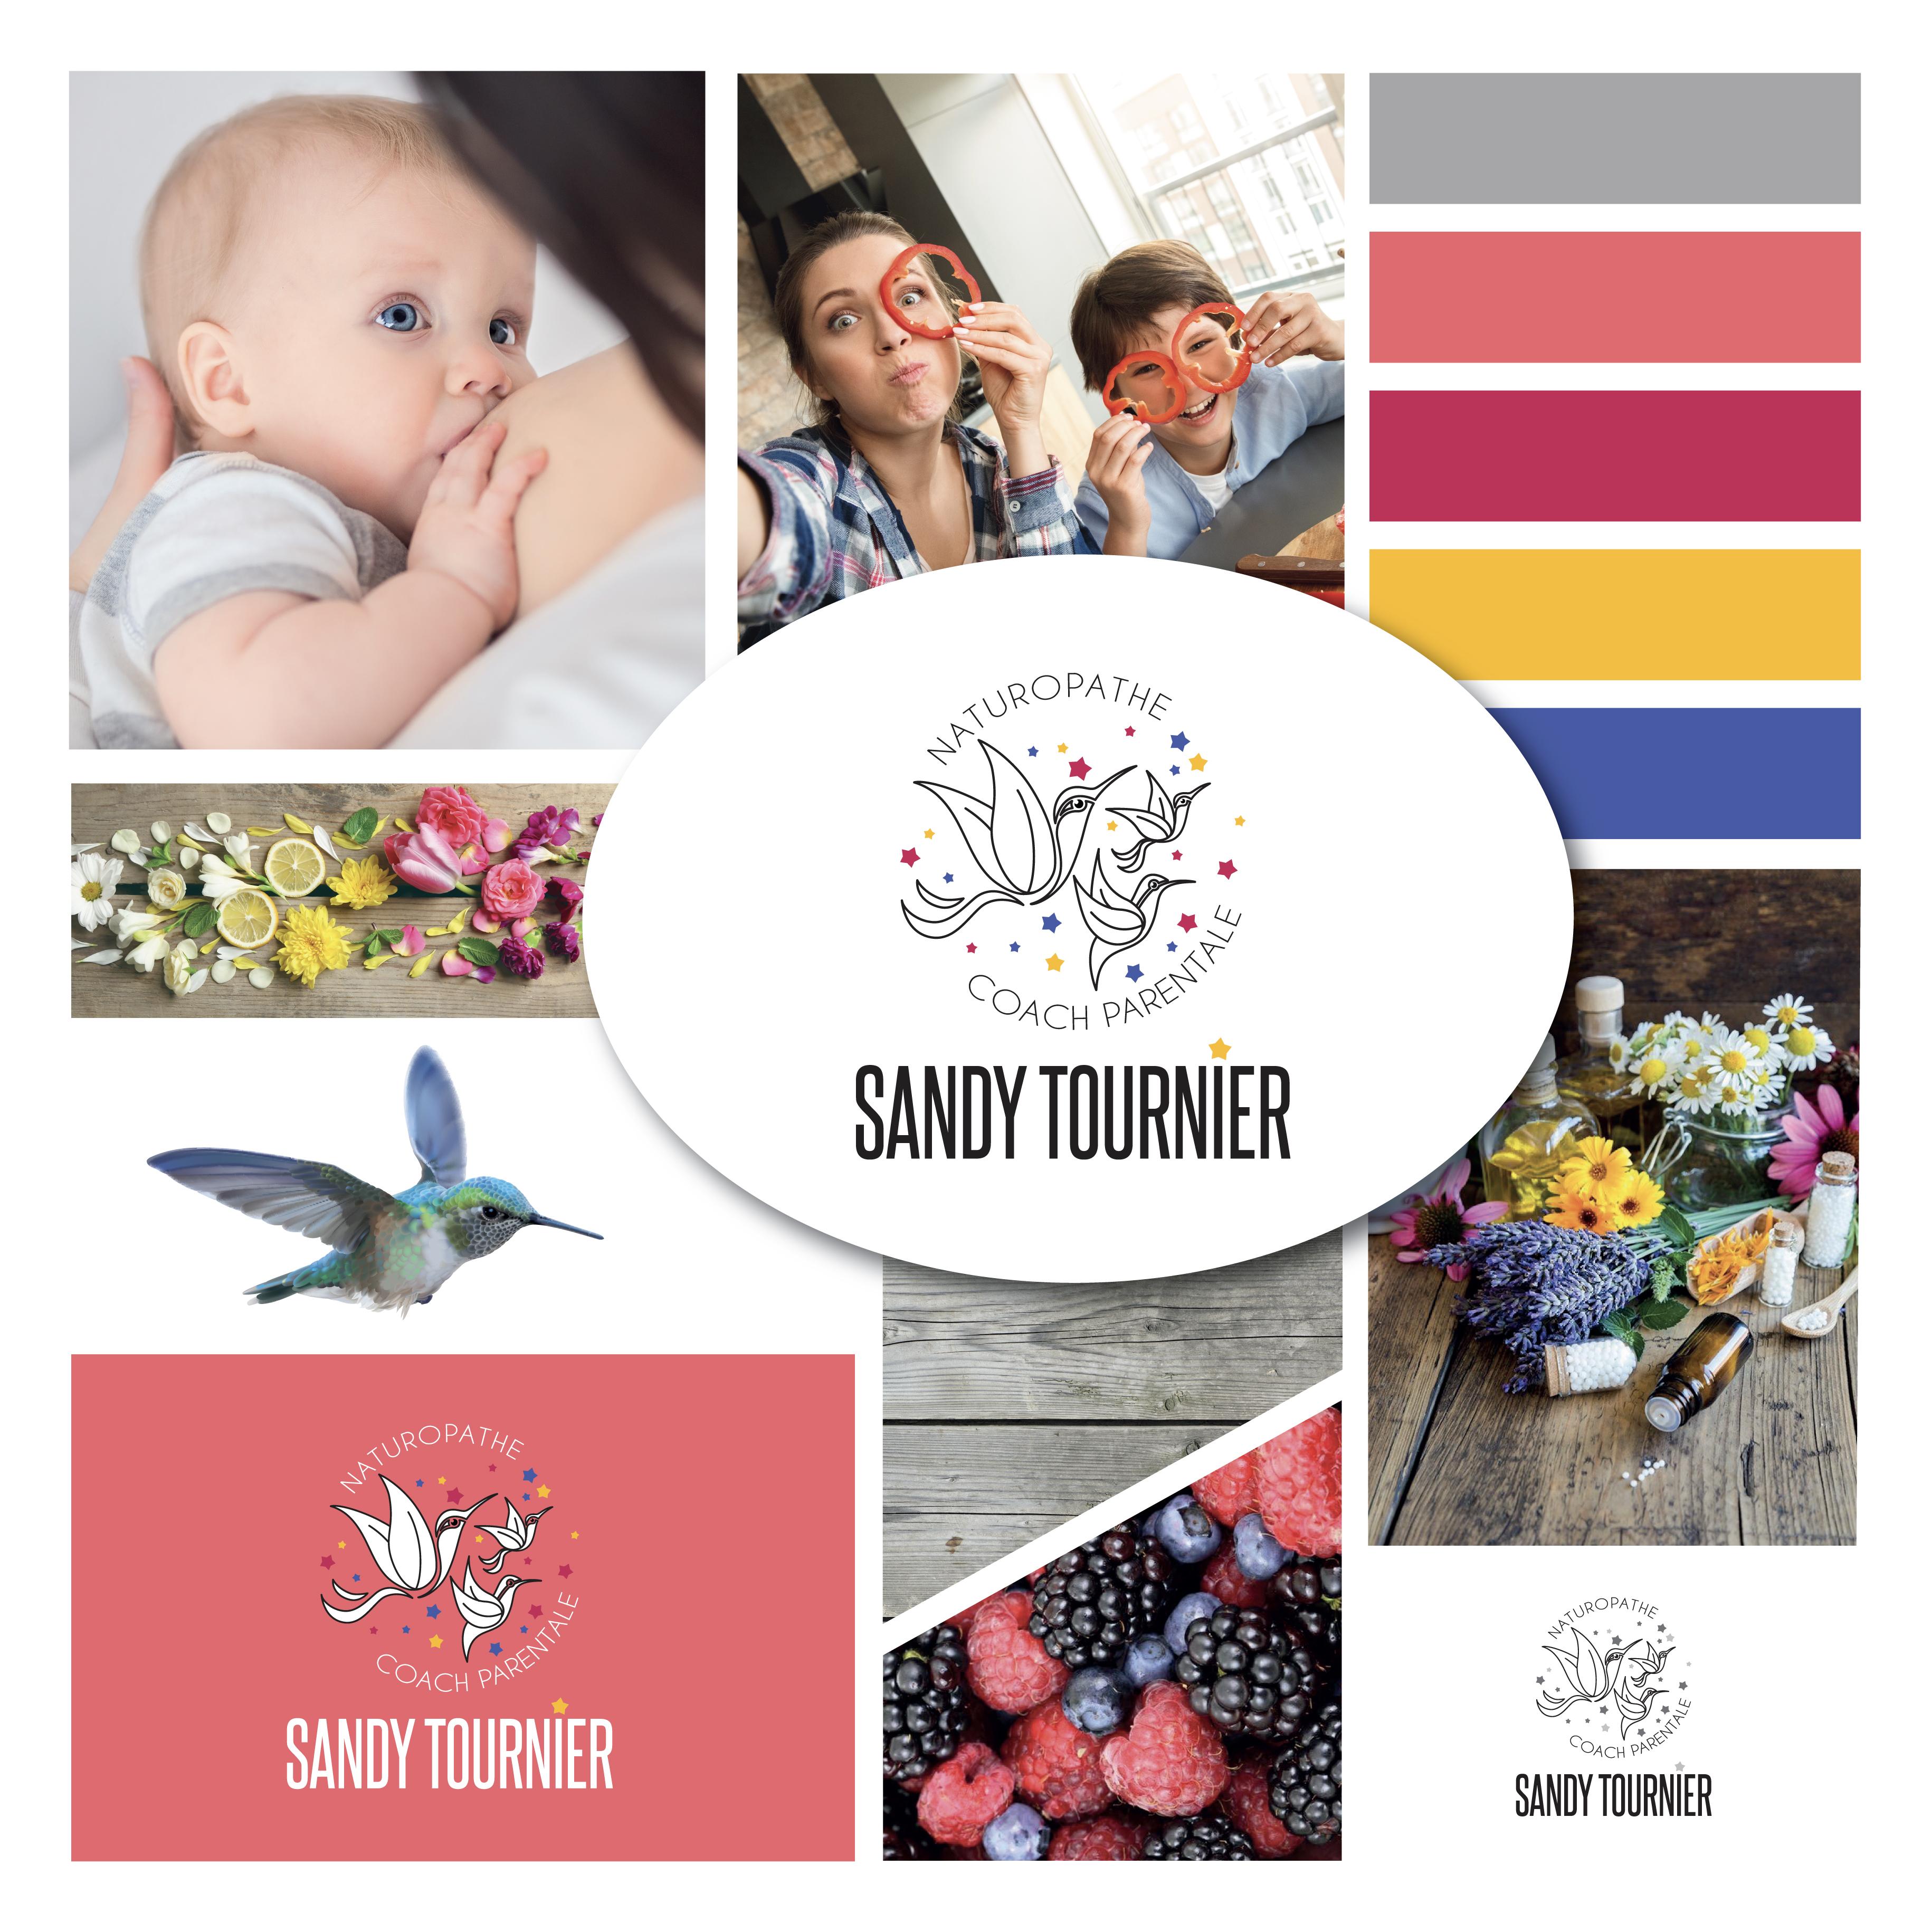 TOURNIER-SANDY-MOOD-BOARD